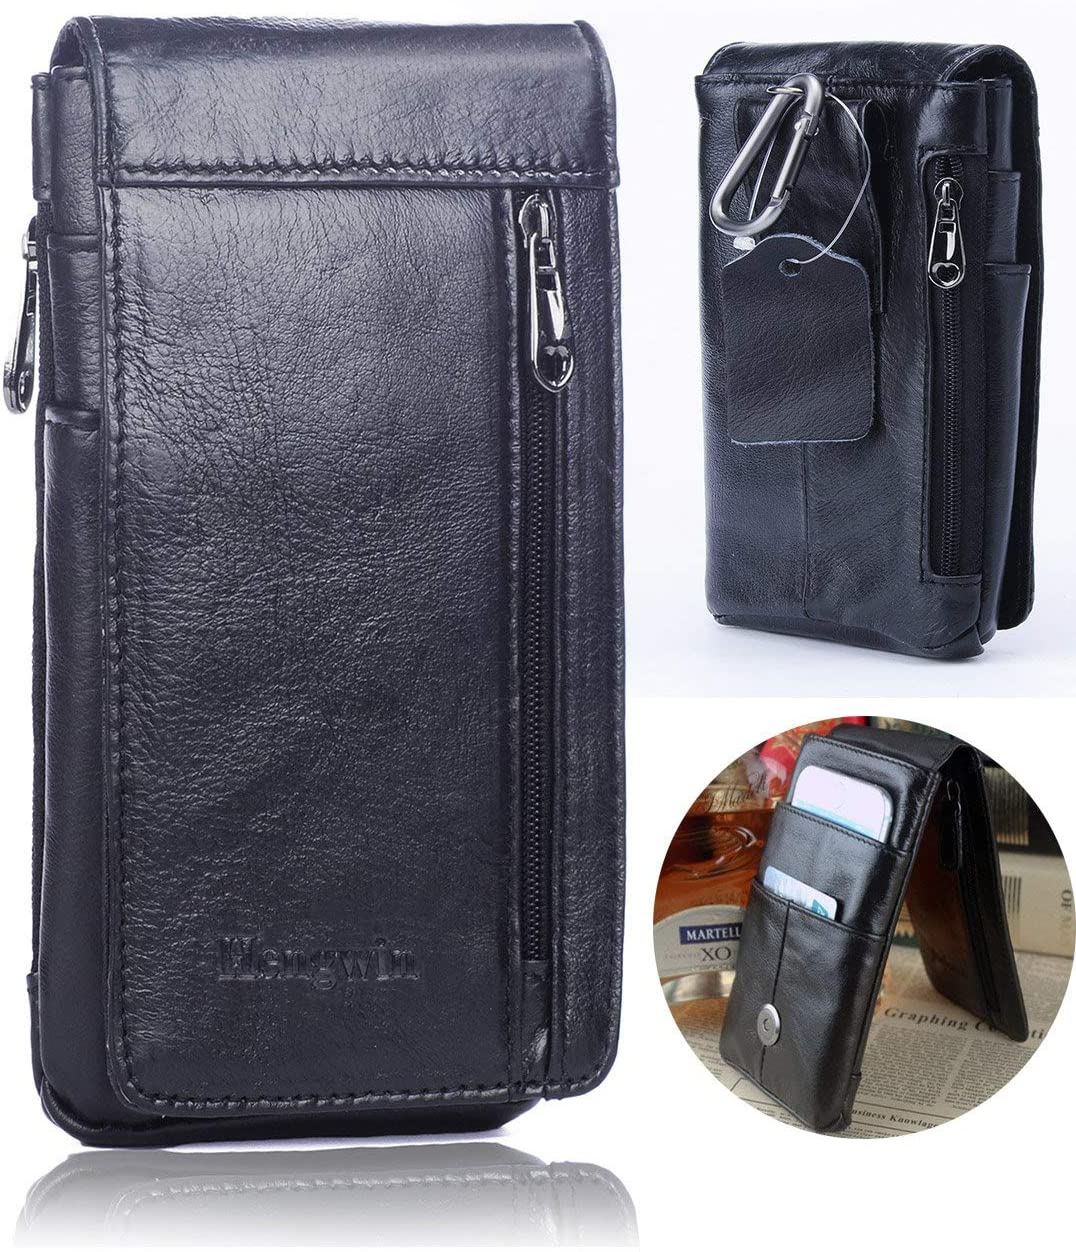 Hwin Belt Case Pouch Belt Clip Holster Compatible iPhone 8 Plus, Premium Leather Phone Pouch Carrying Case Belt Loops Ultrathin Waist Bag Men's Purse Galaxy S8/S9 Plus LG Stylo 3/G6/V30+Keyring-Black